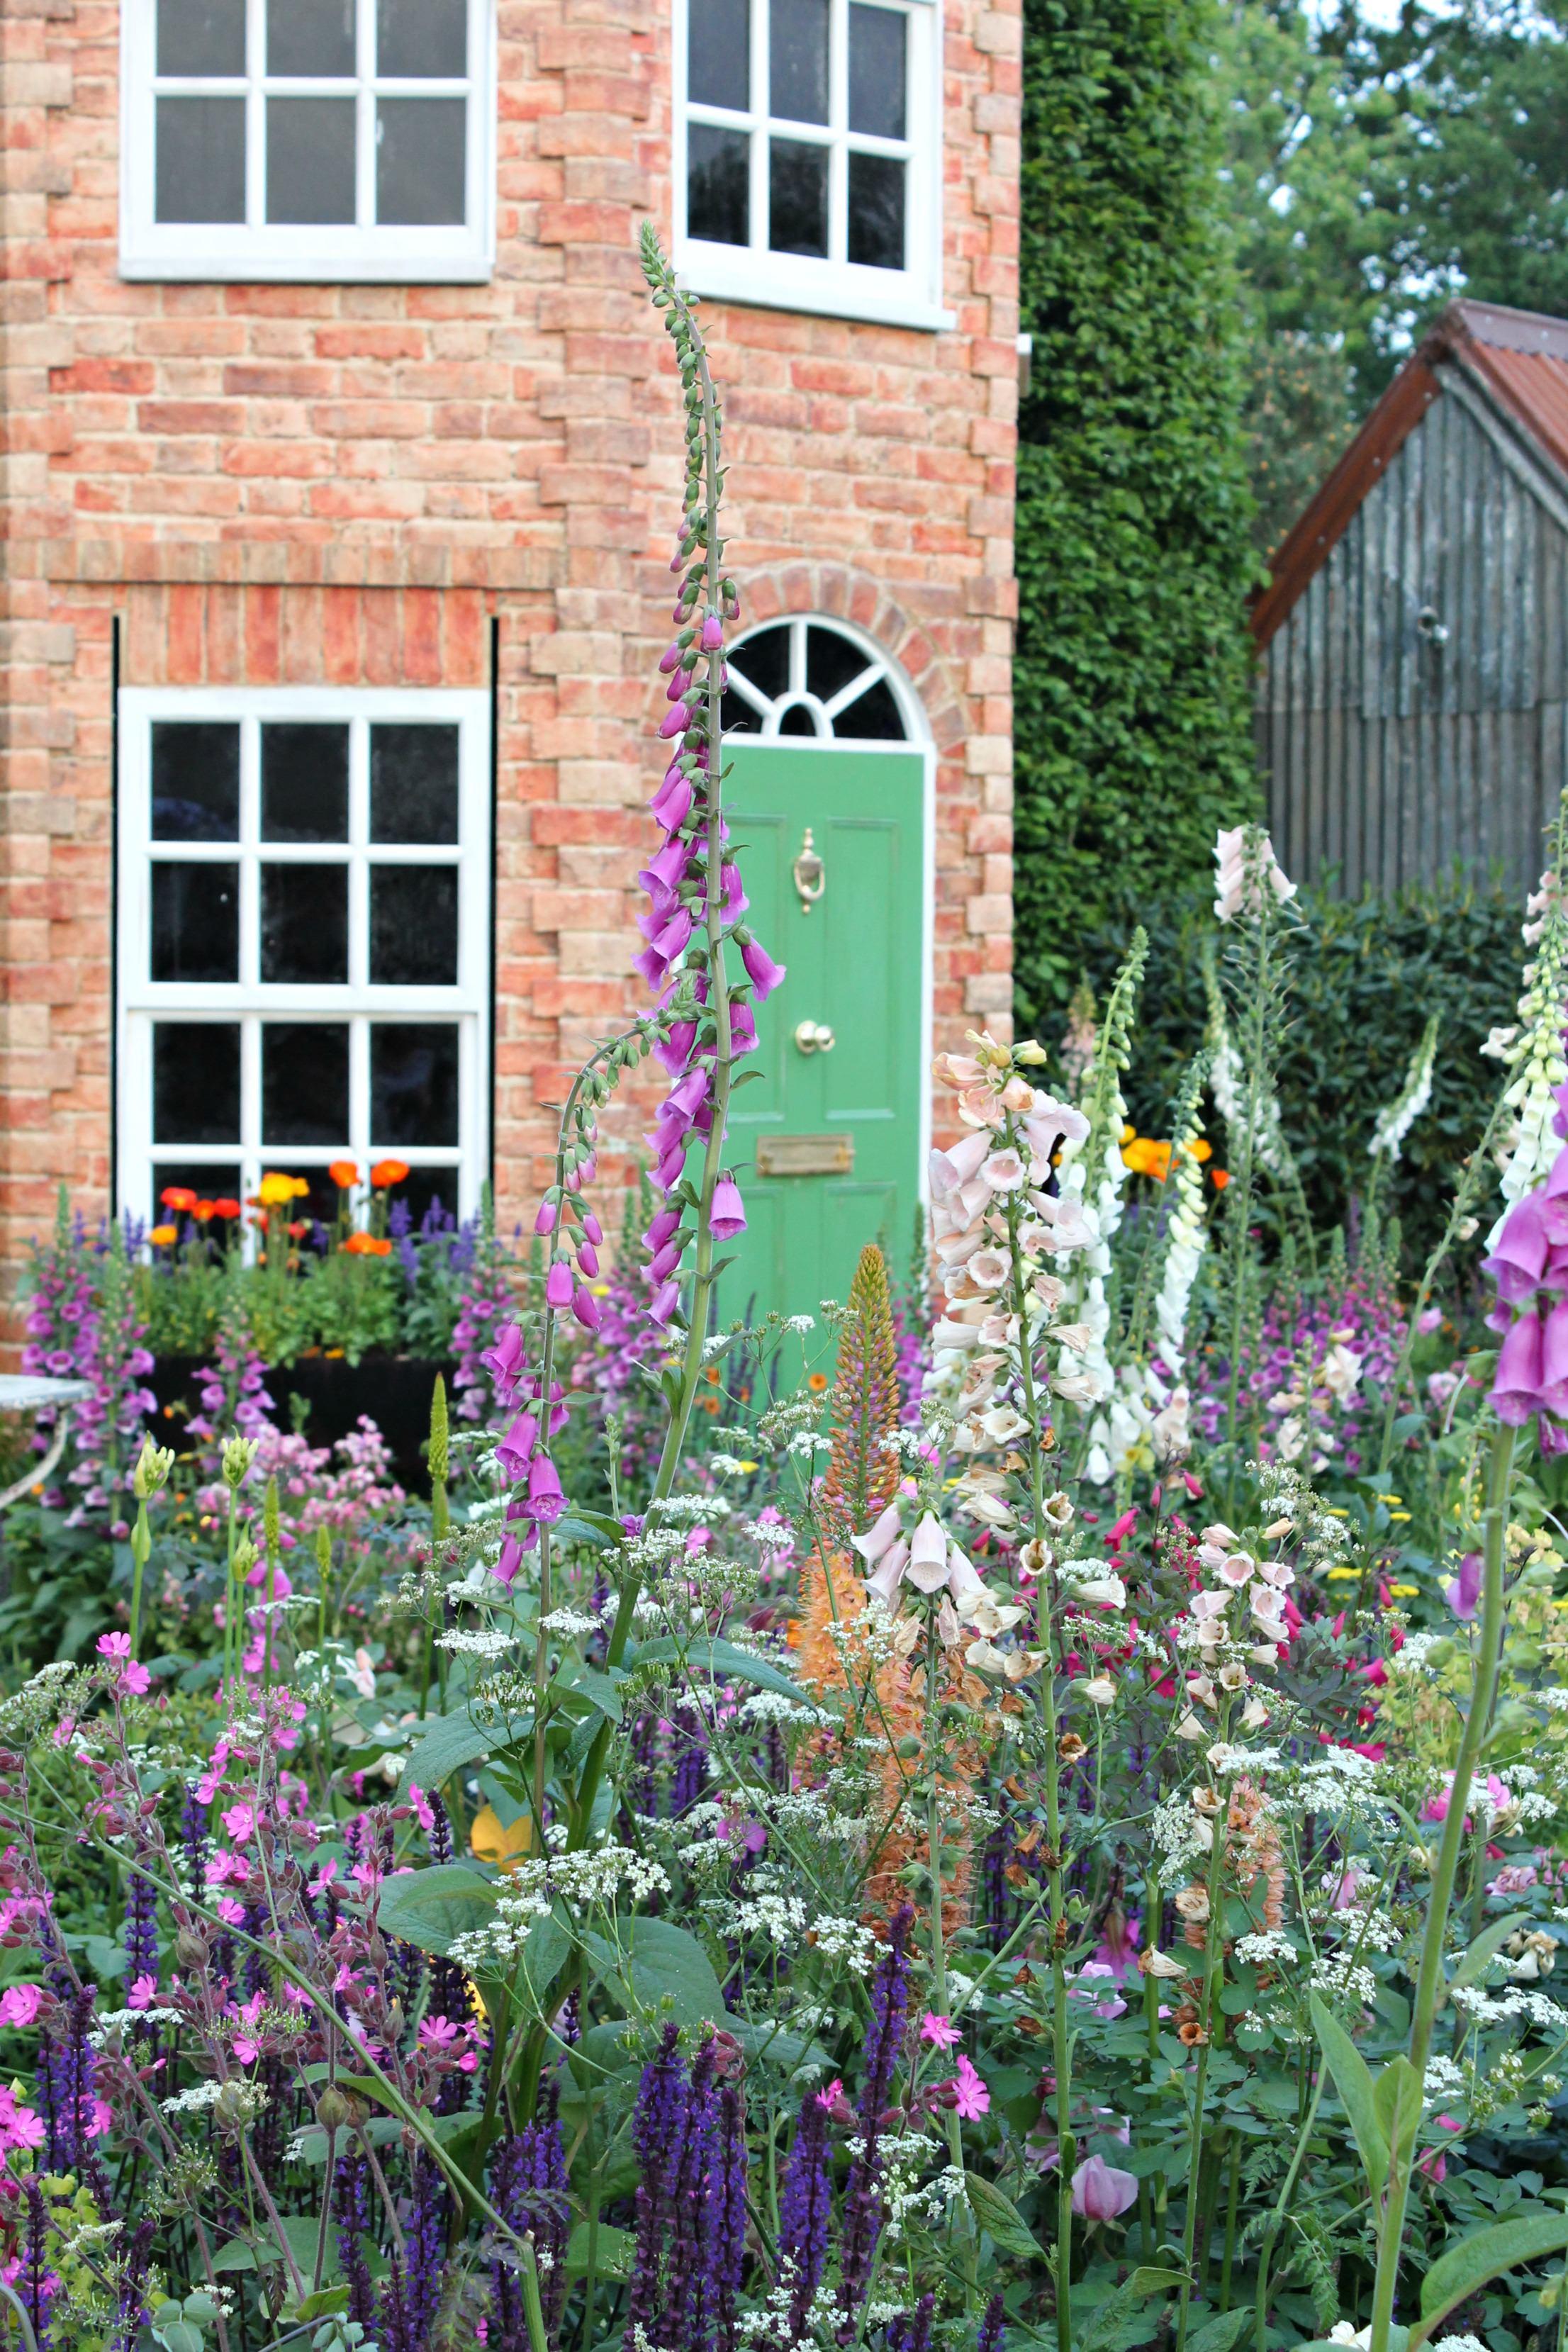 Colourful-garden-Chelsea-flower-show-photo-by-Geraldine-Tan-Little-Big-Bell